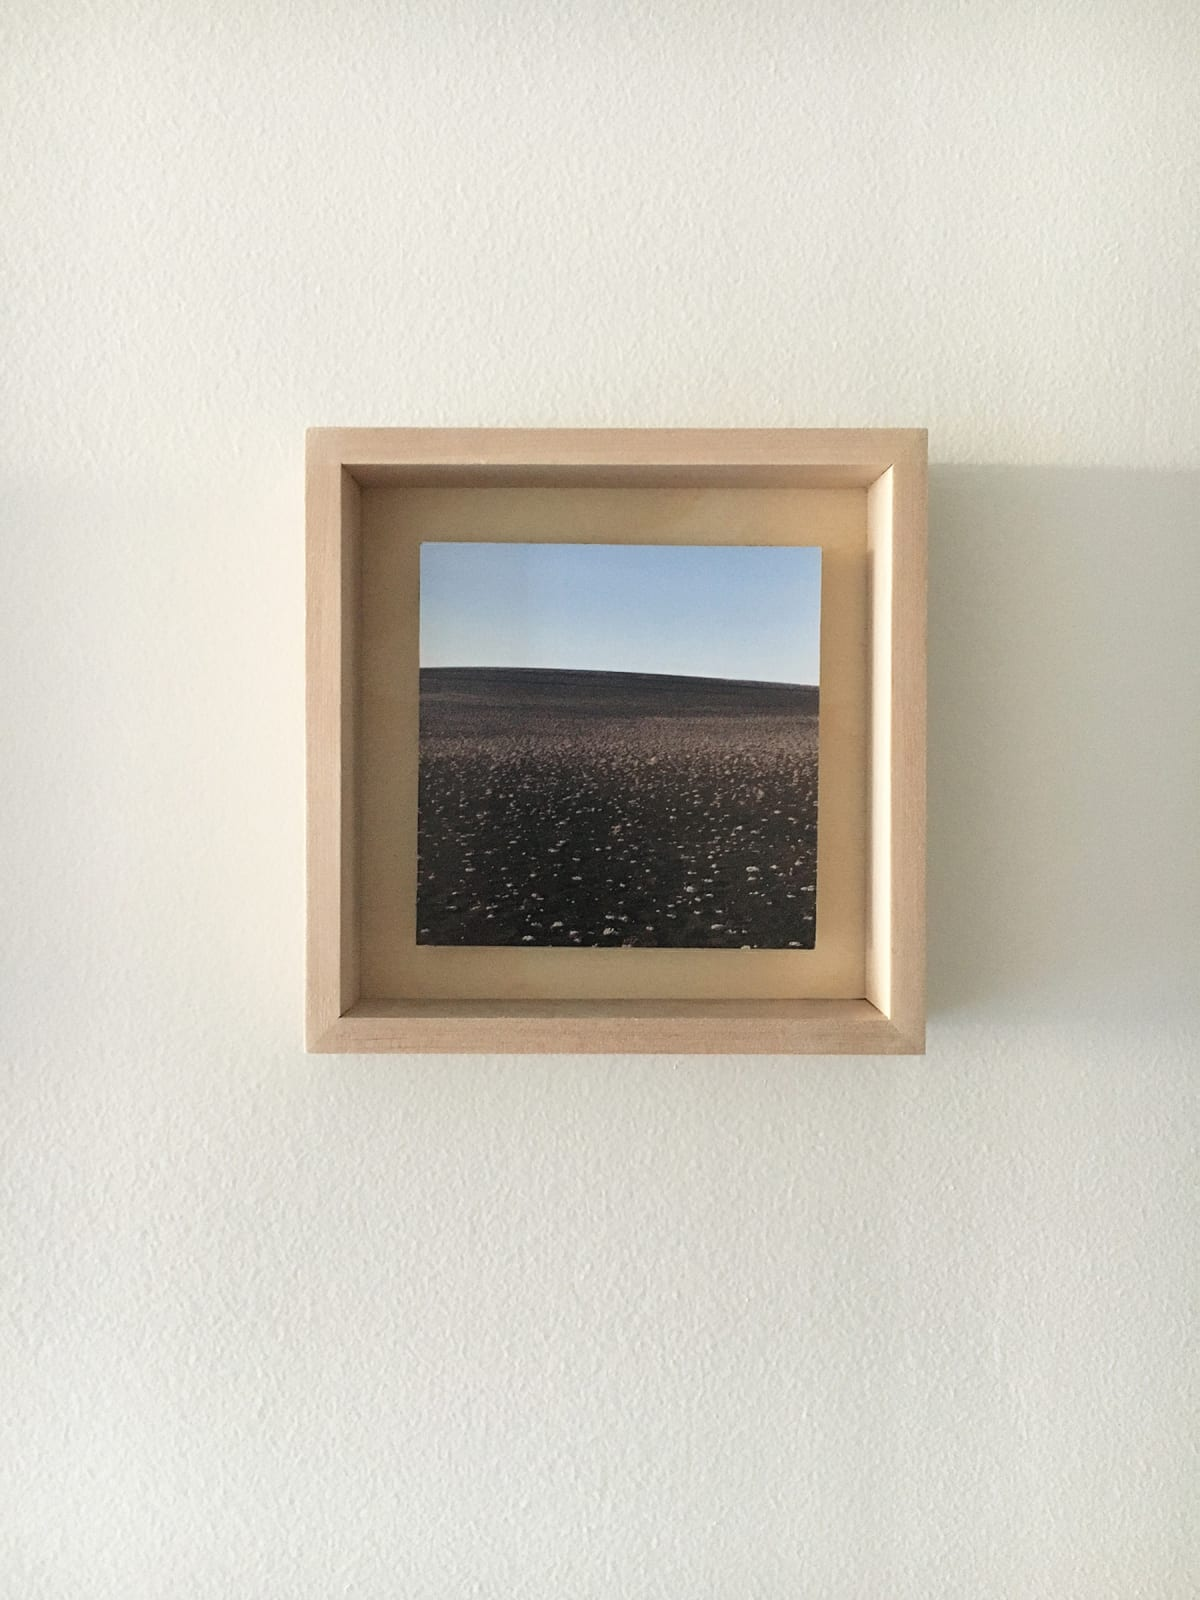 Grace Clark Sweet Fields XI, 2020 digital pigment print 6 x 6 inches, edition 1/3 $ 500.00